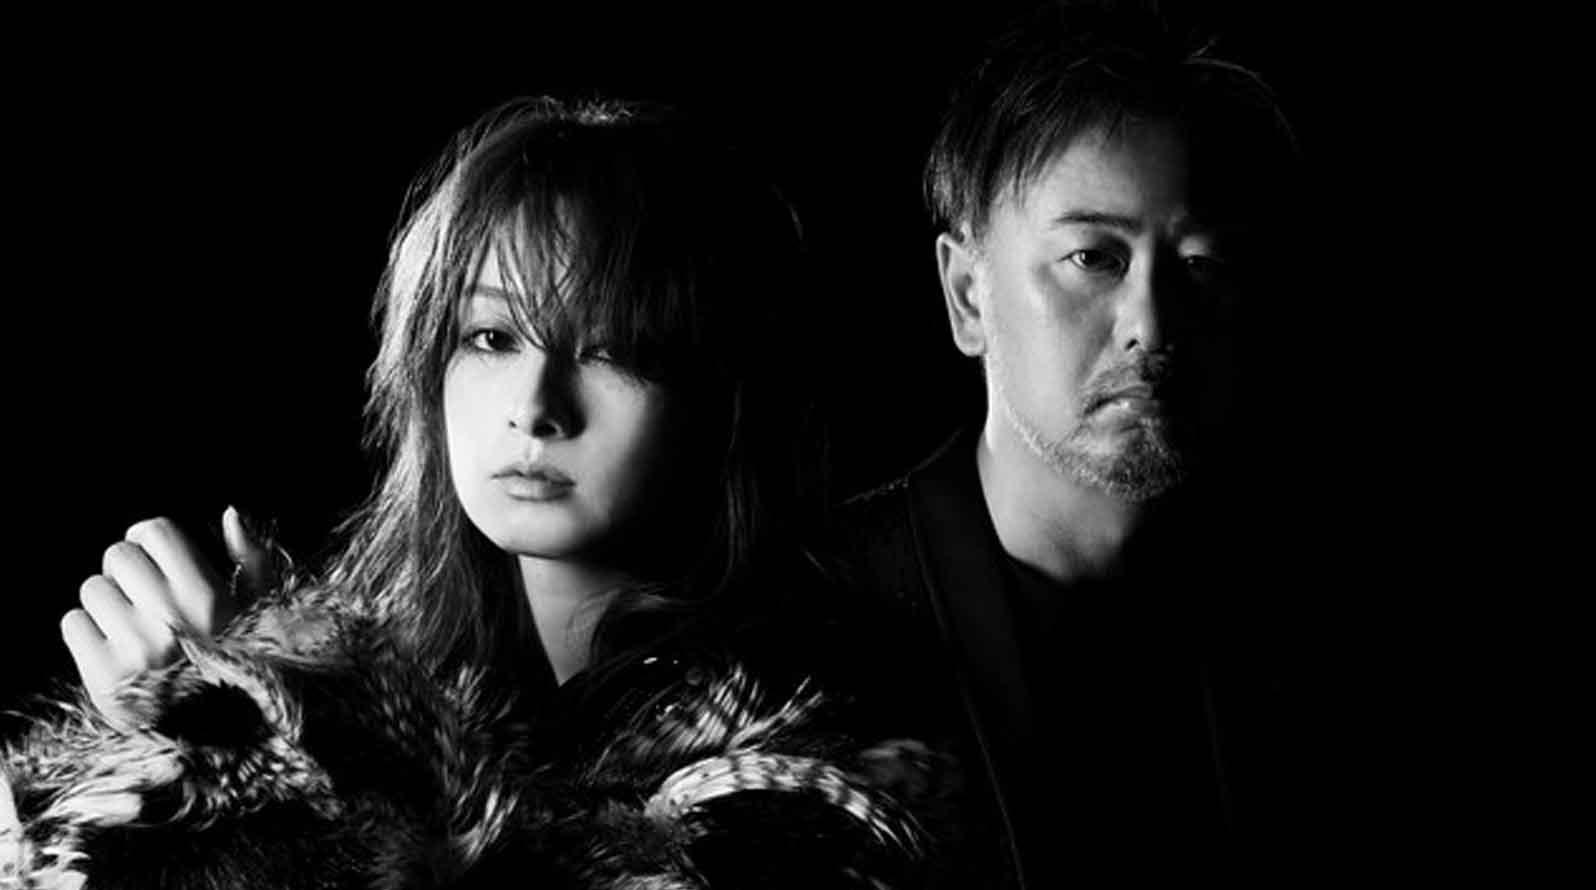 Do As Infinity(大無限樂團)原創專輯《ALIVE》推出 製作人邀來澤野弘之擔綱